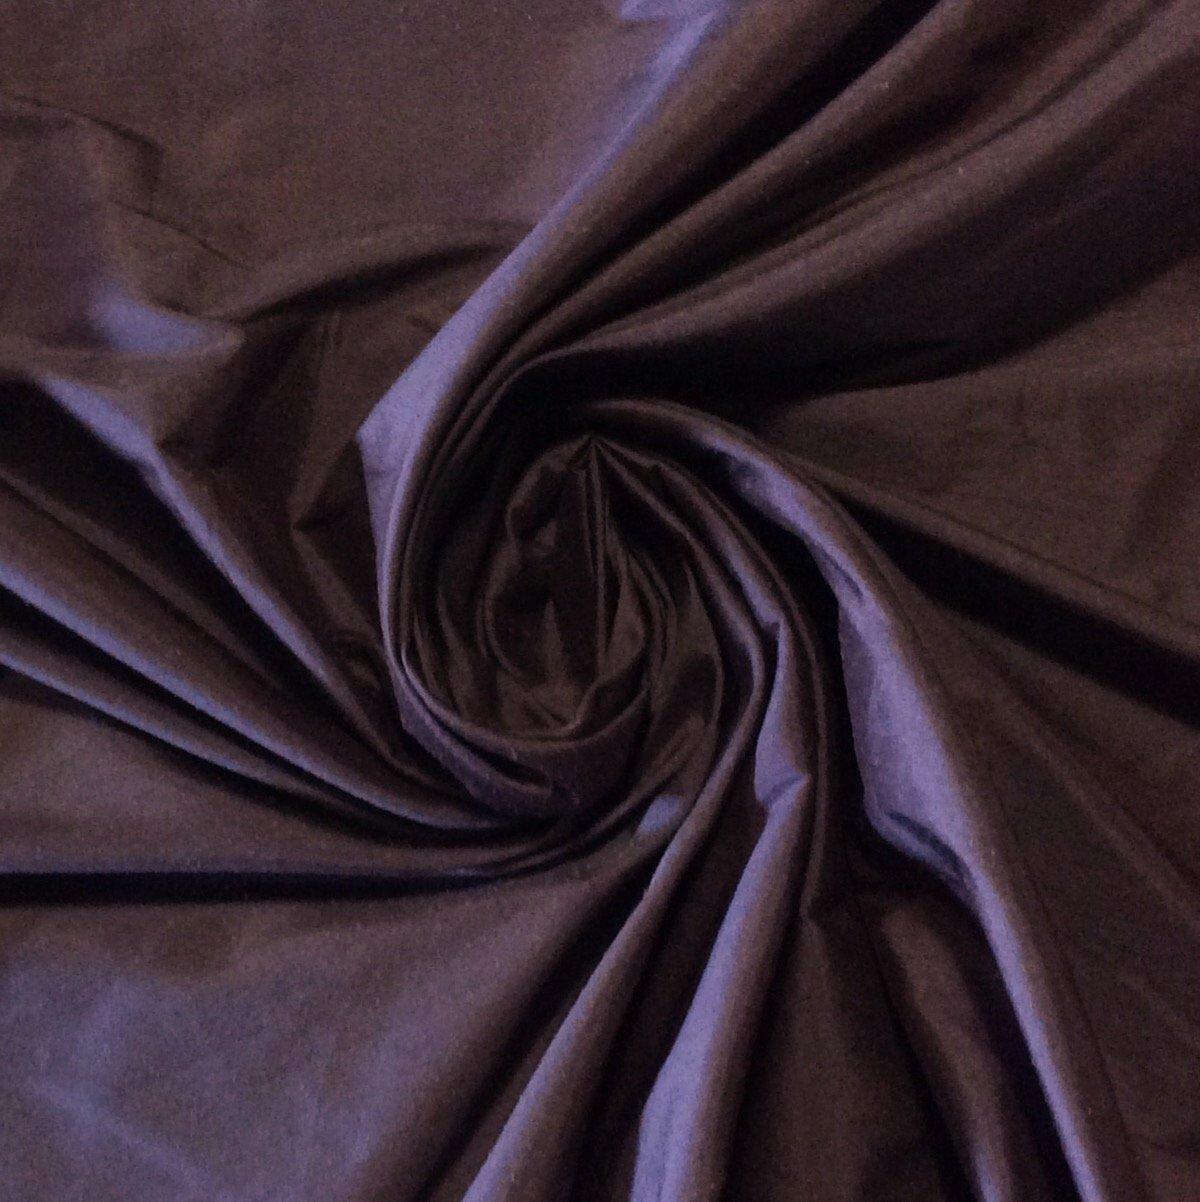 SMW02 Eggplant Exotic Machine Woven Dupioni 100% Silk Fabric Drapery Fabric BTY